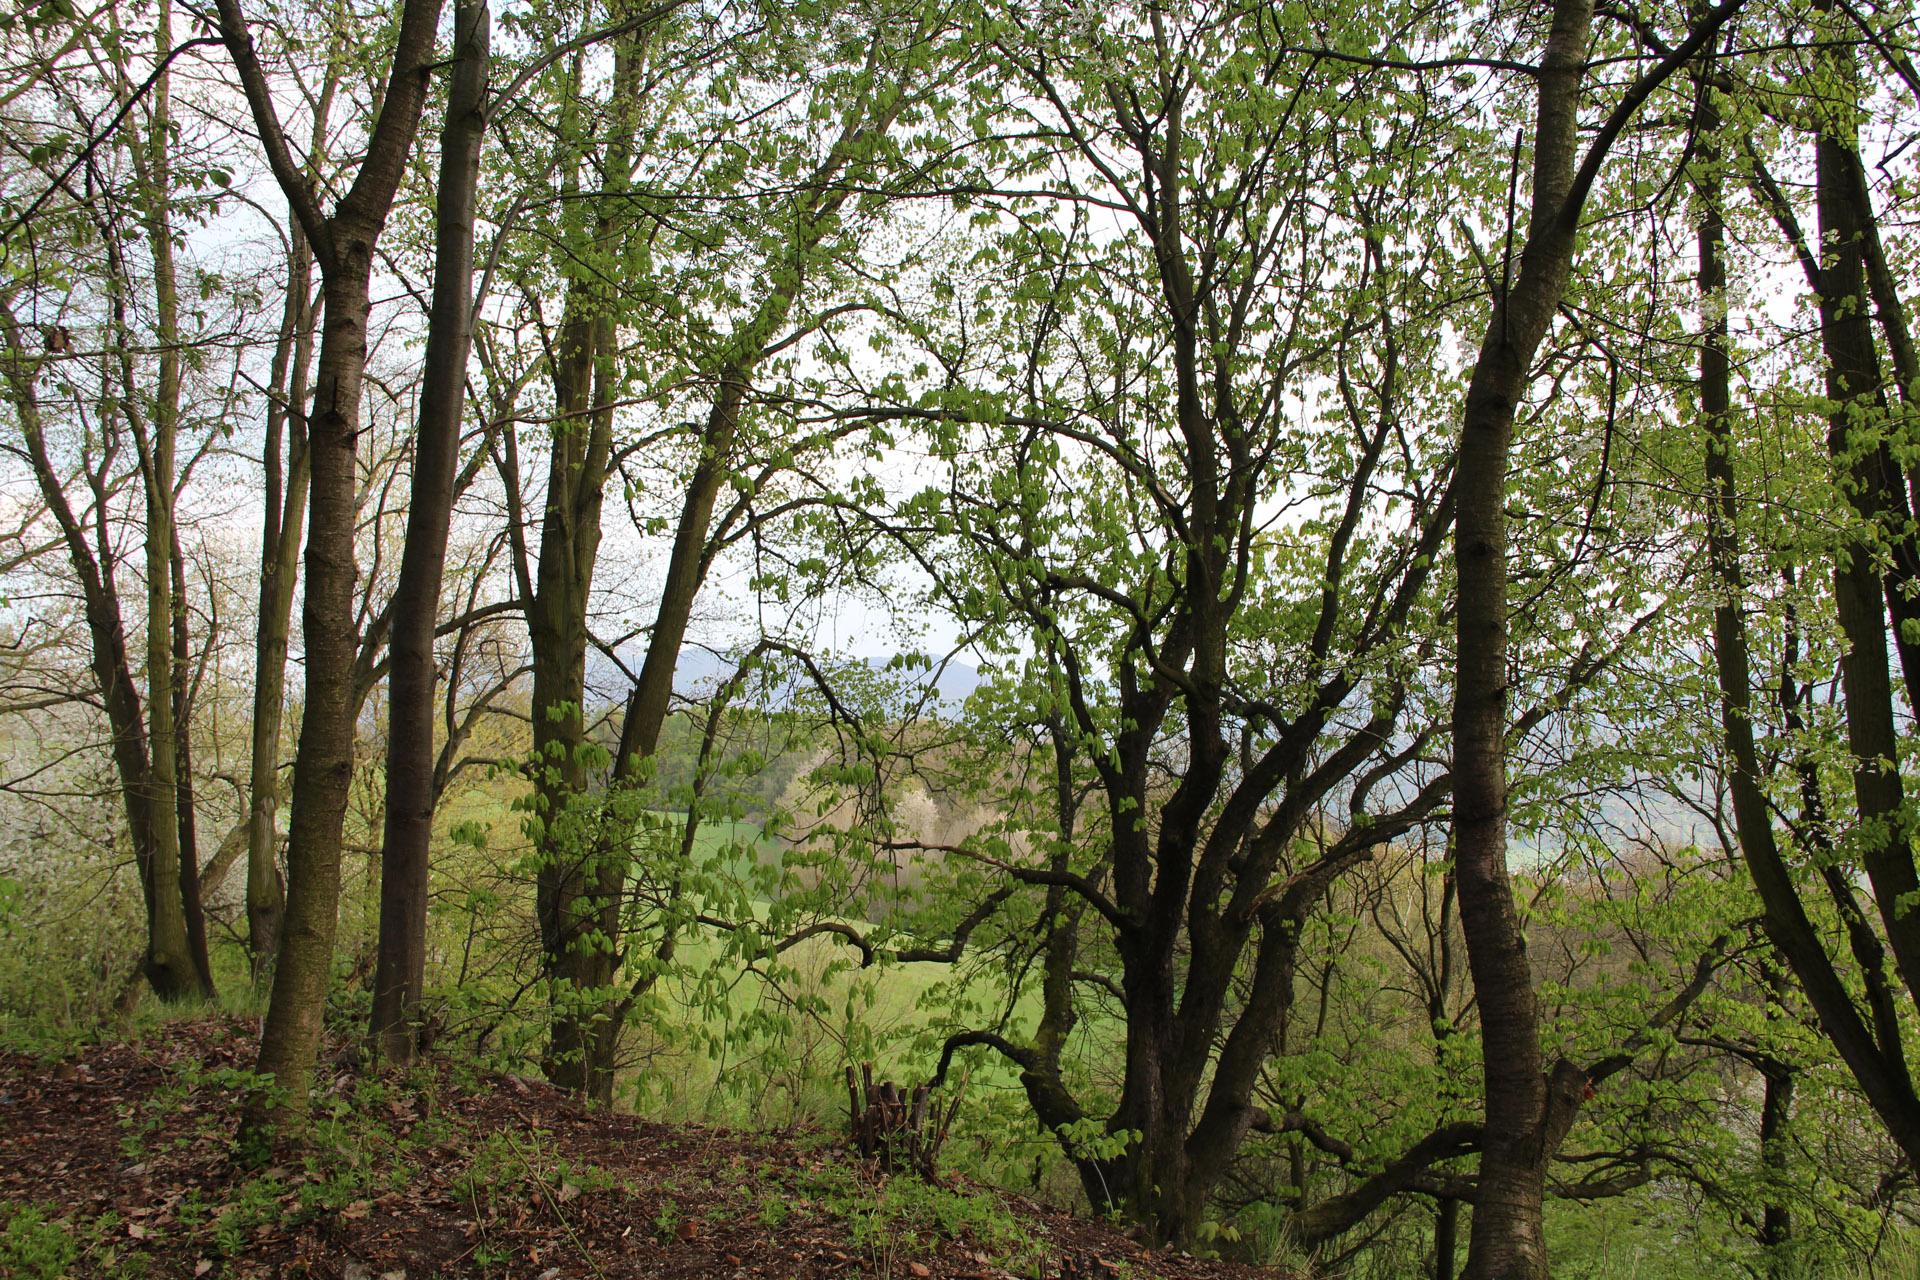 Rozhled přes stromy z vrcholu ferraty Pustevna